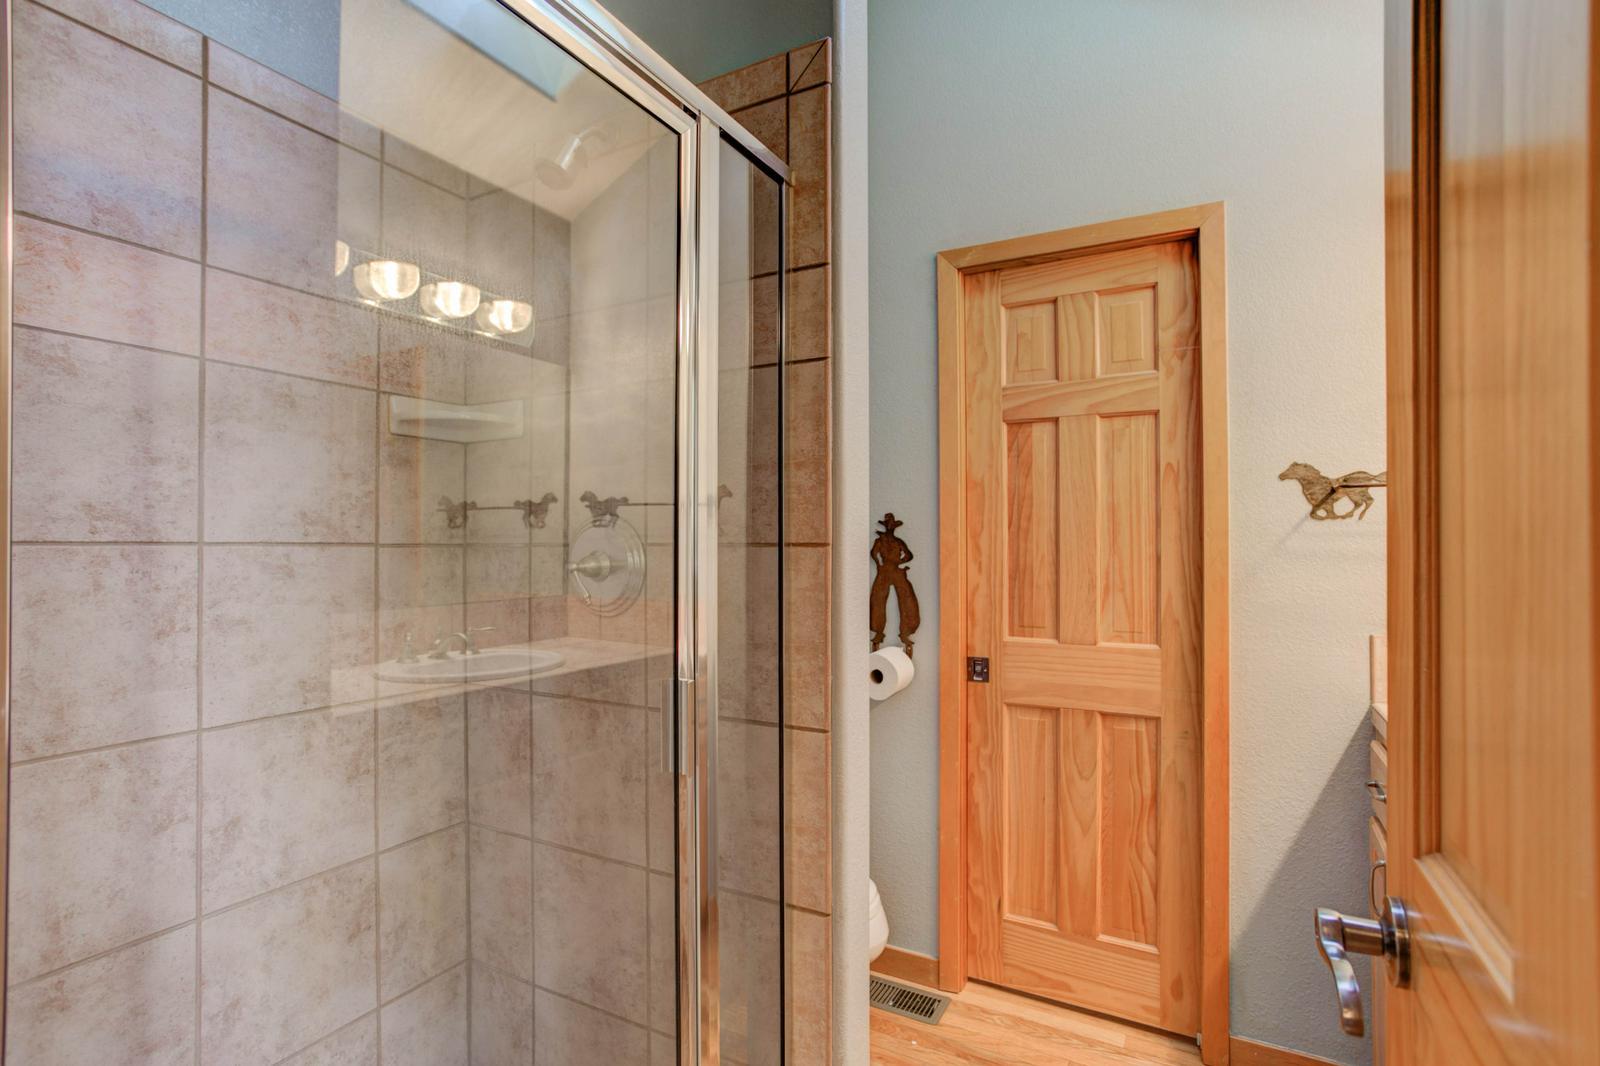 Listassistimage-115862-thumbnail-1572%2bsugarbush%2bdrive_bathroom02-1600x1600